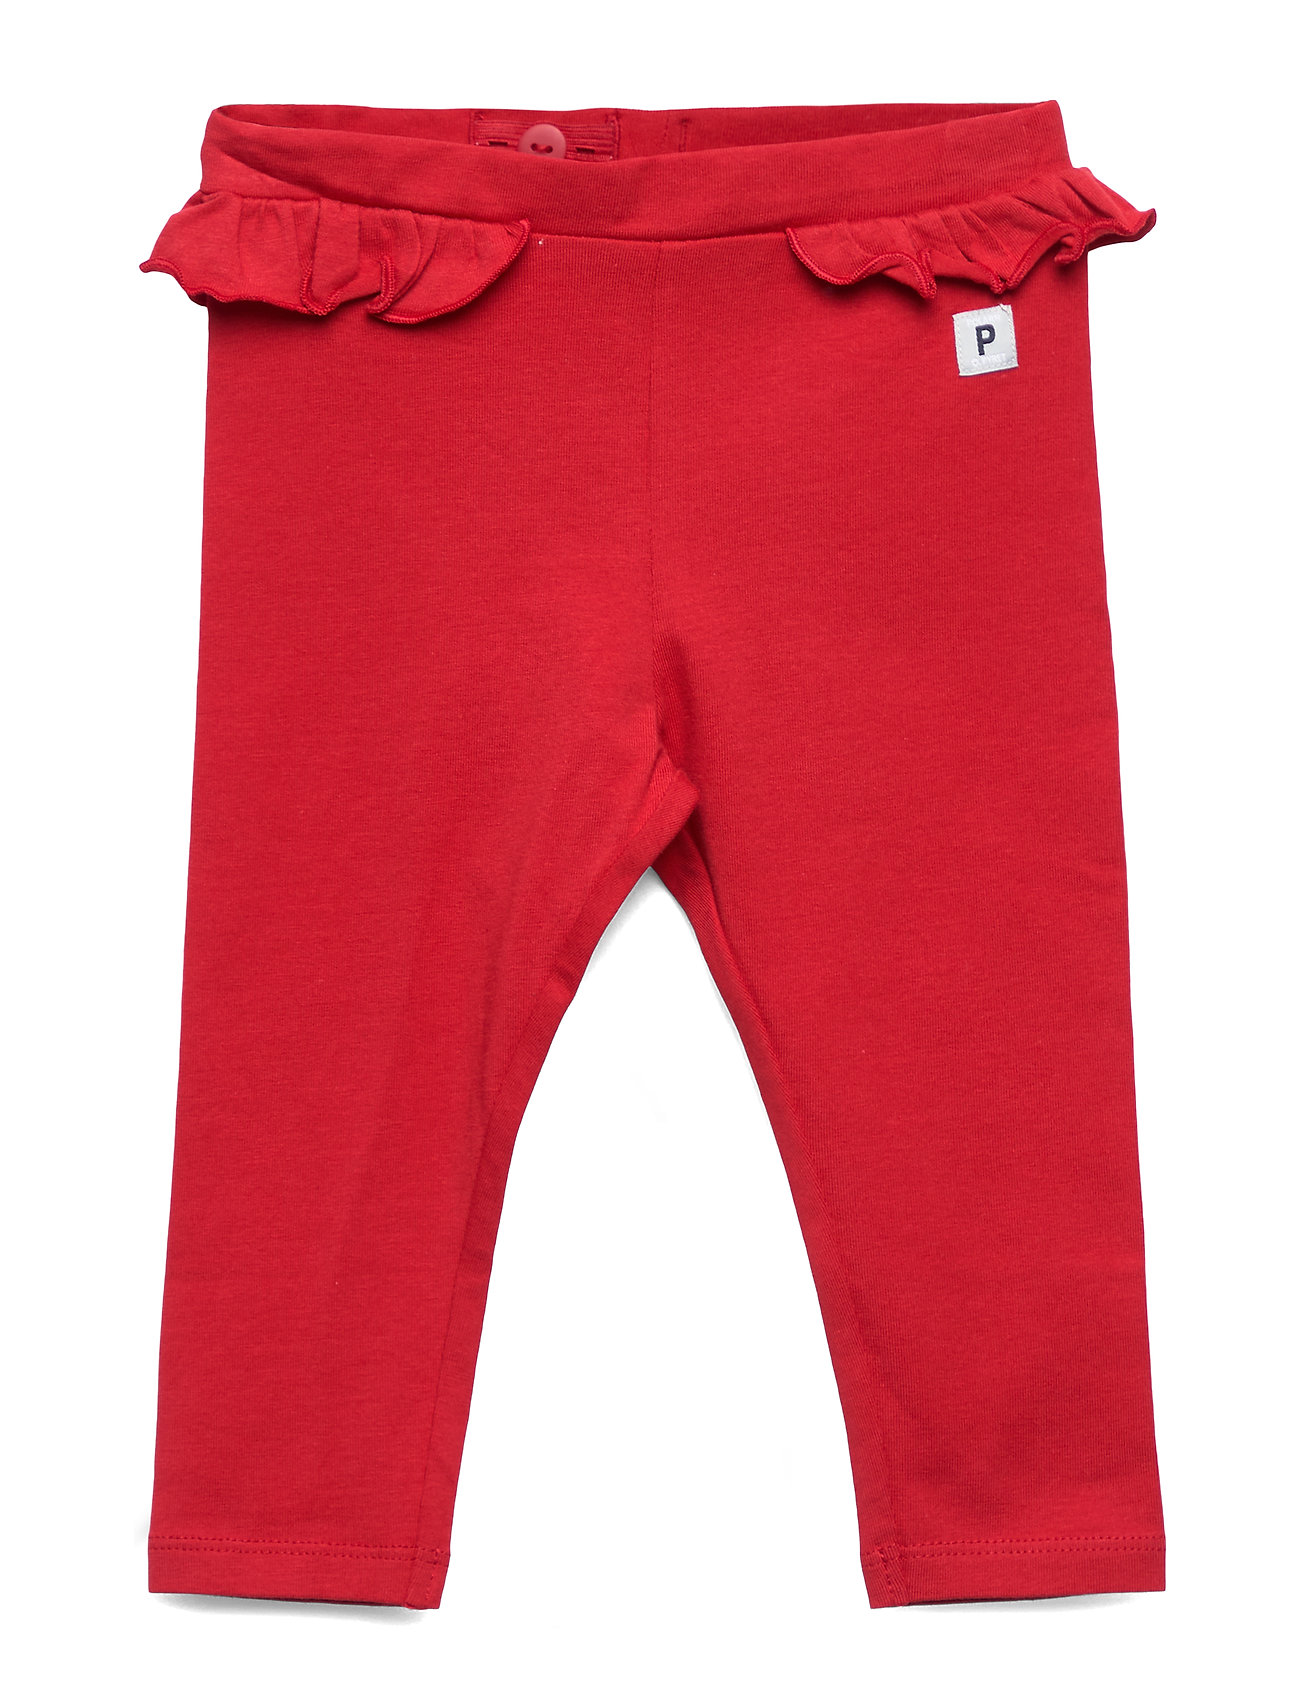 Polarn O. Pyret Leggings solid Baby - CHILI PEPPER